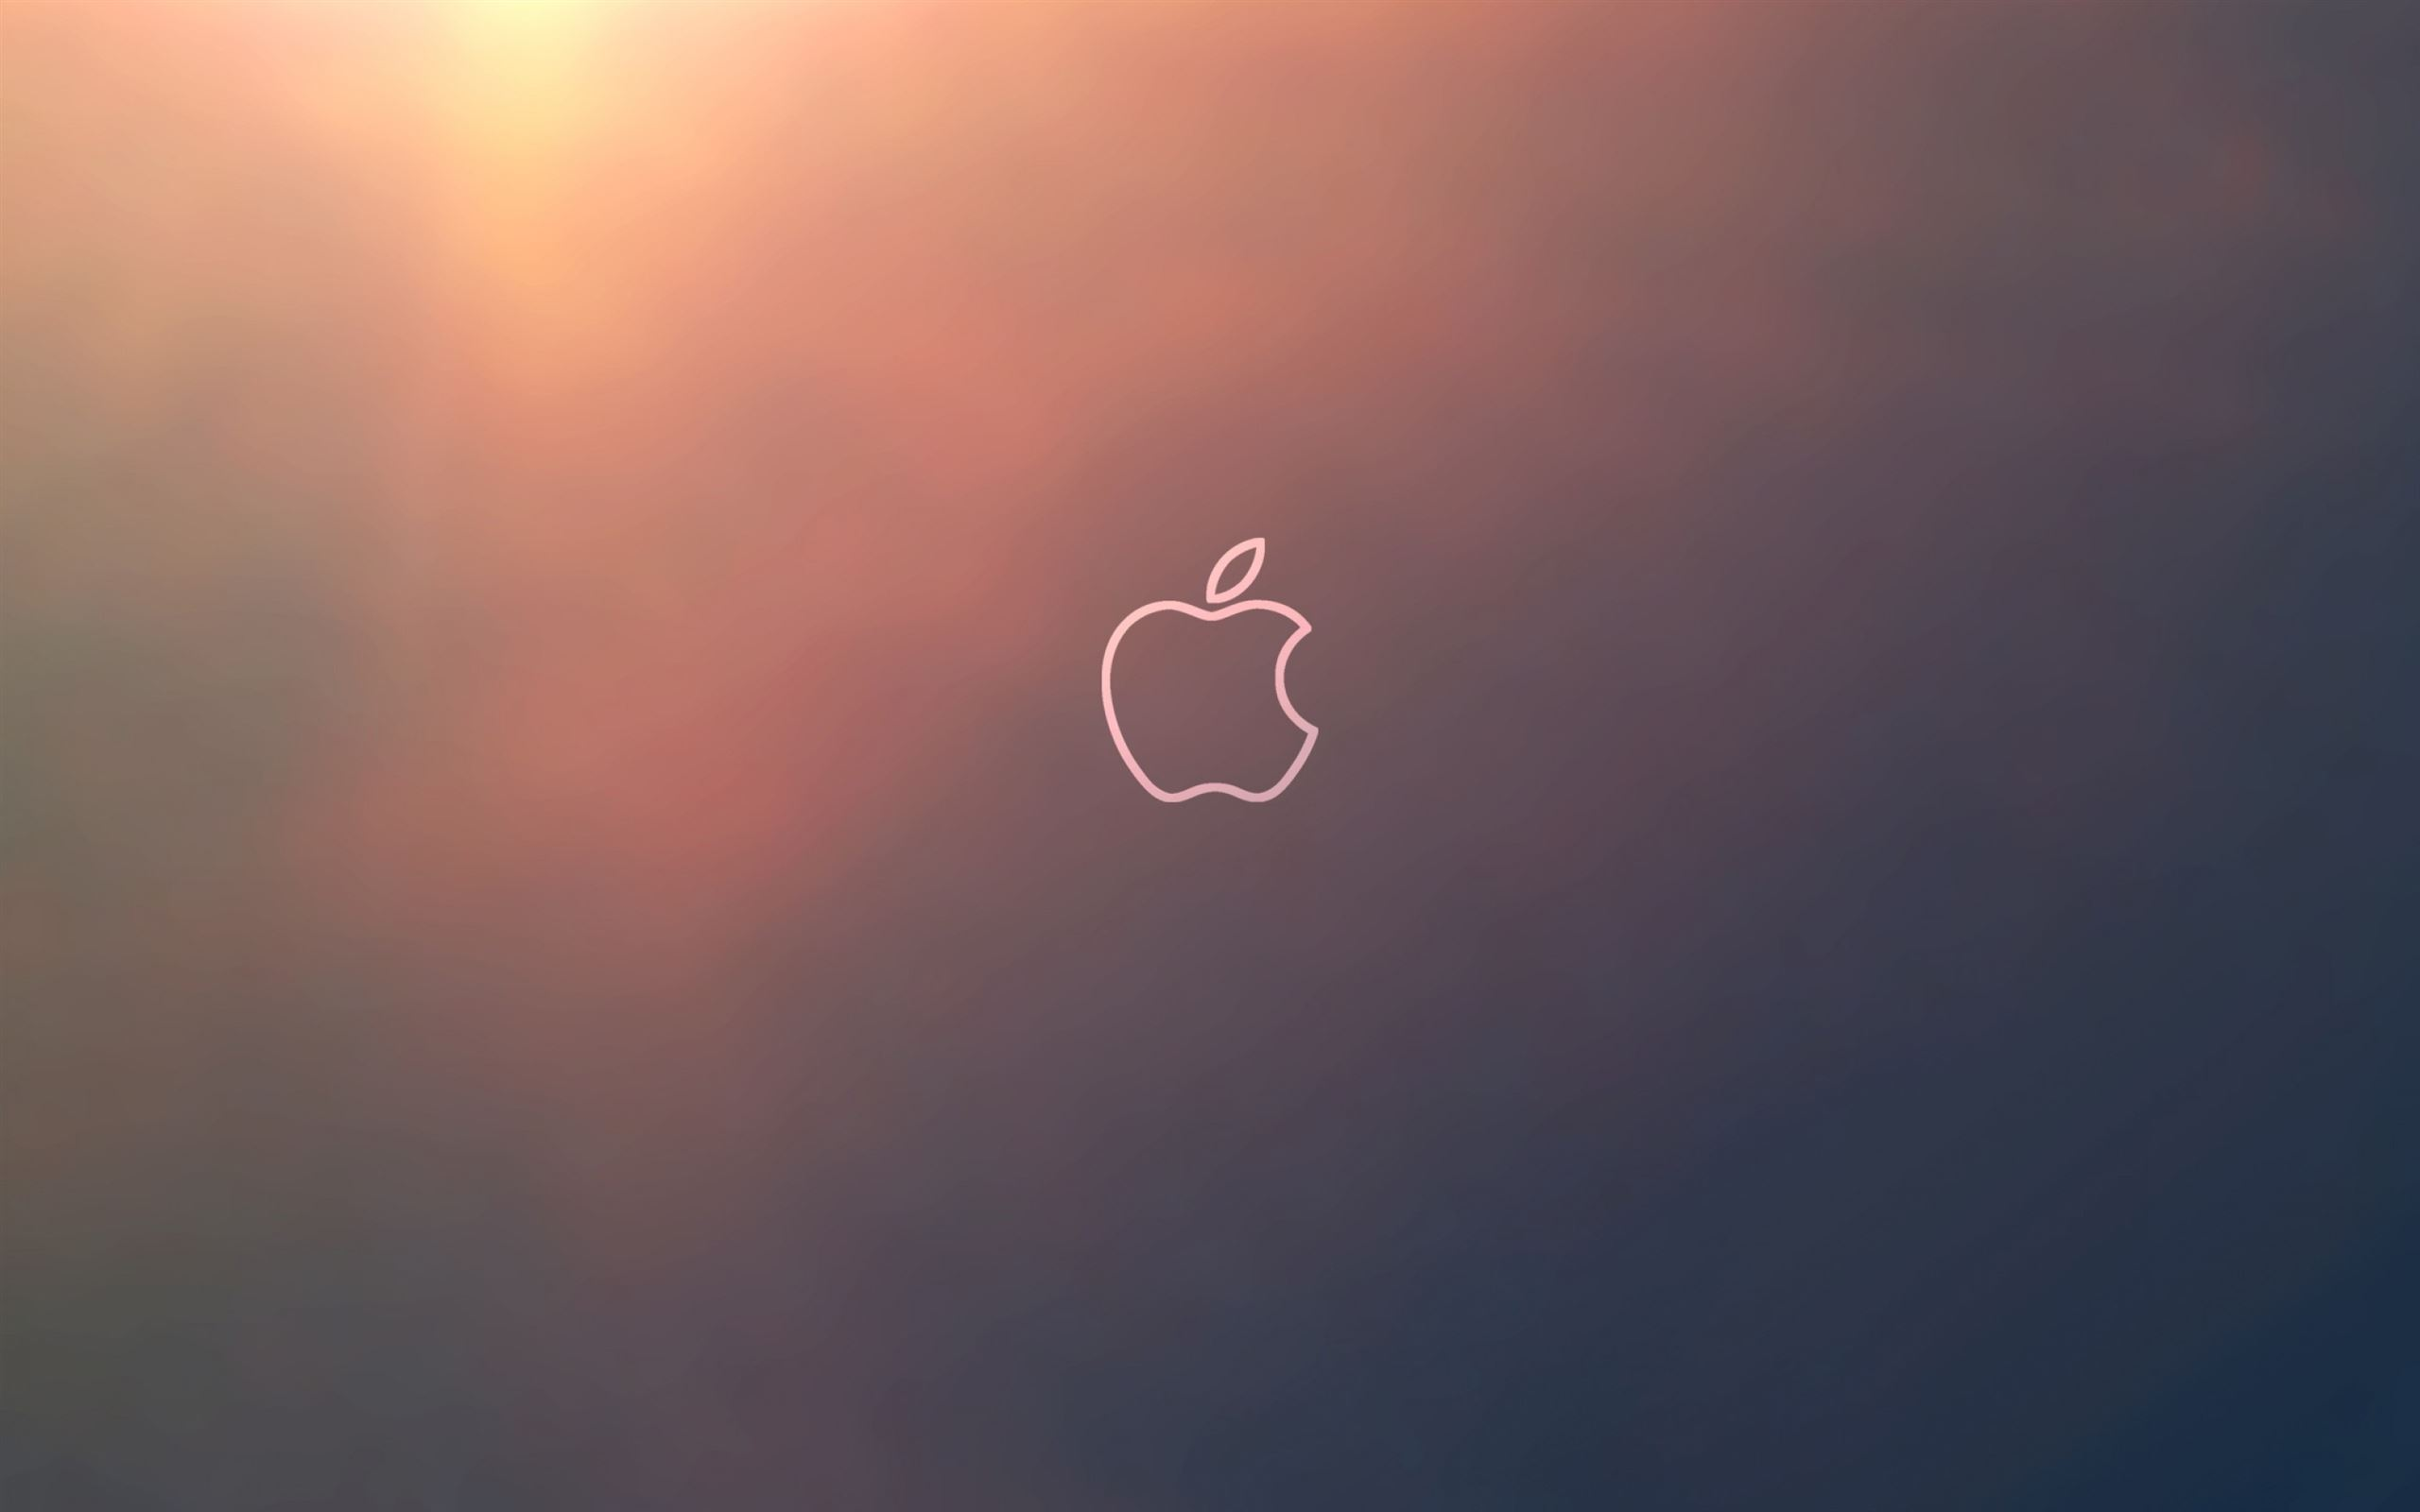 10000+ All Mac Wallpapers Free HD Download | AllMacWallpaper